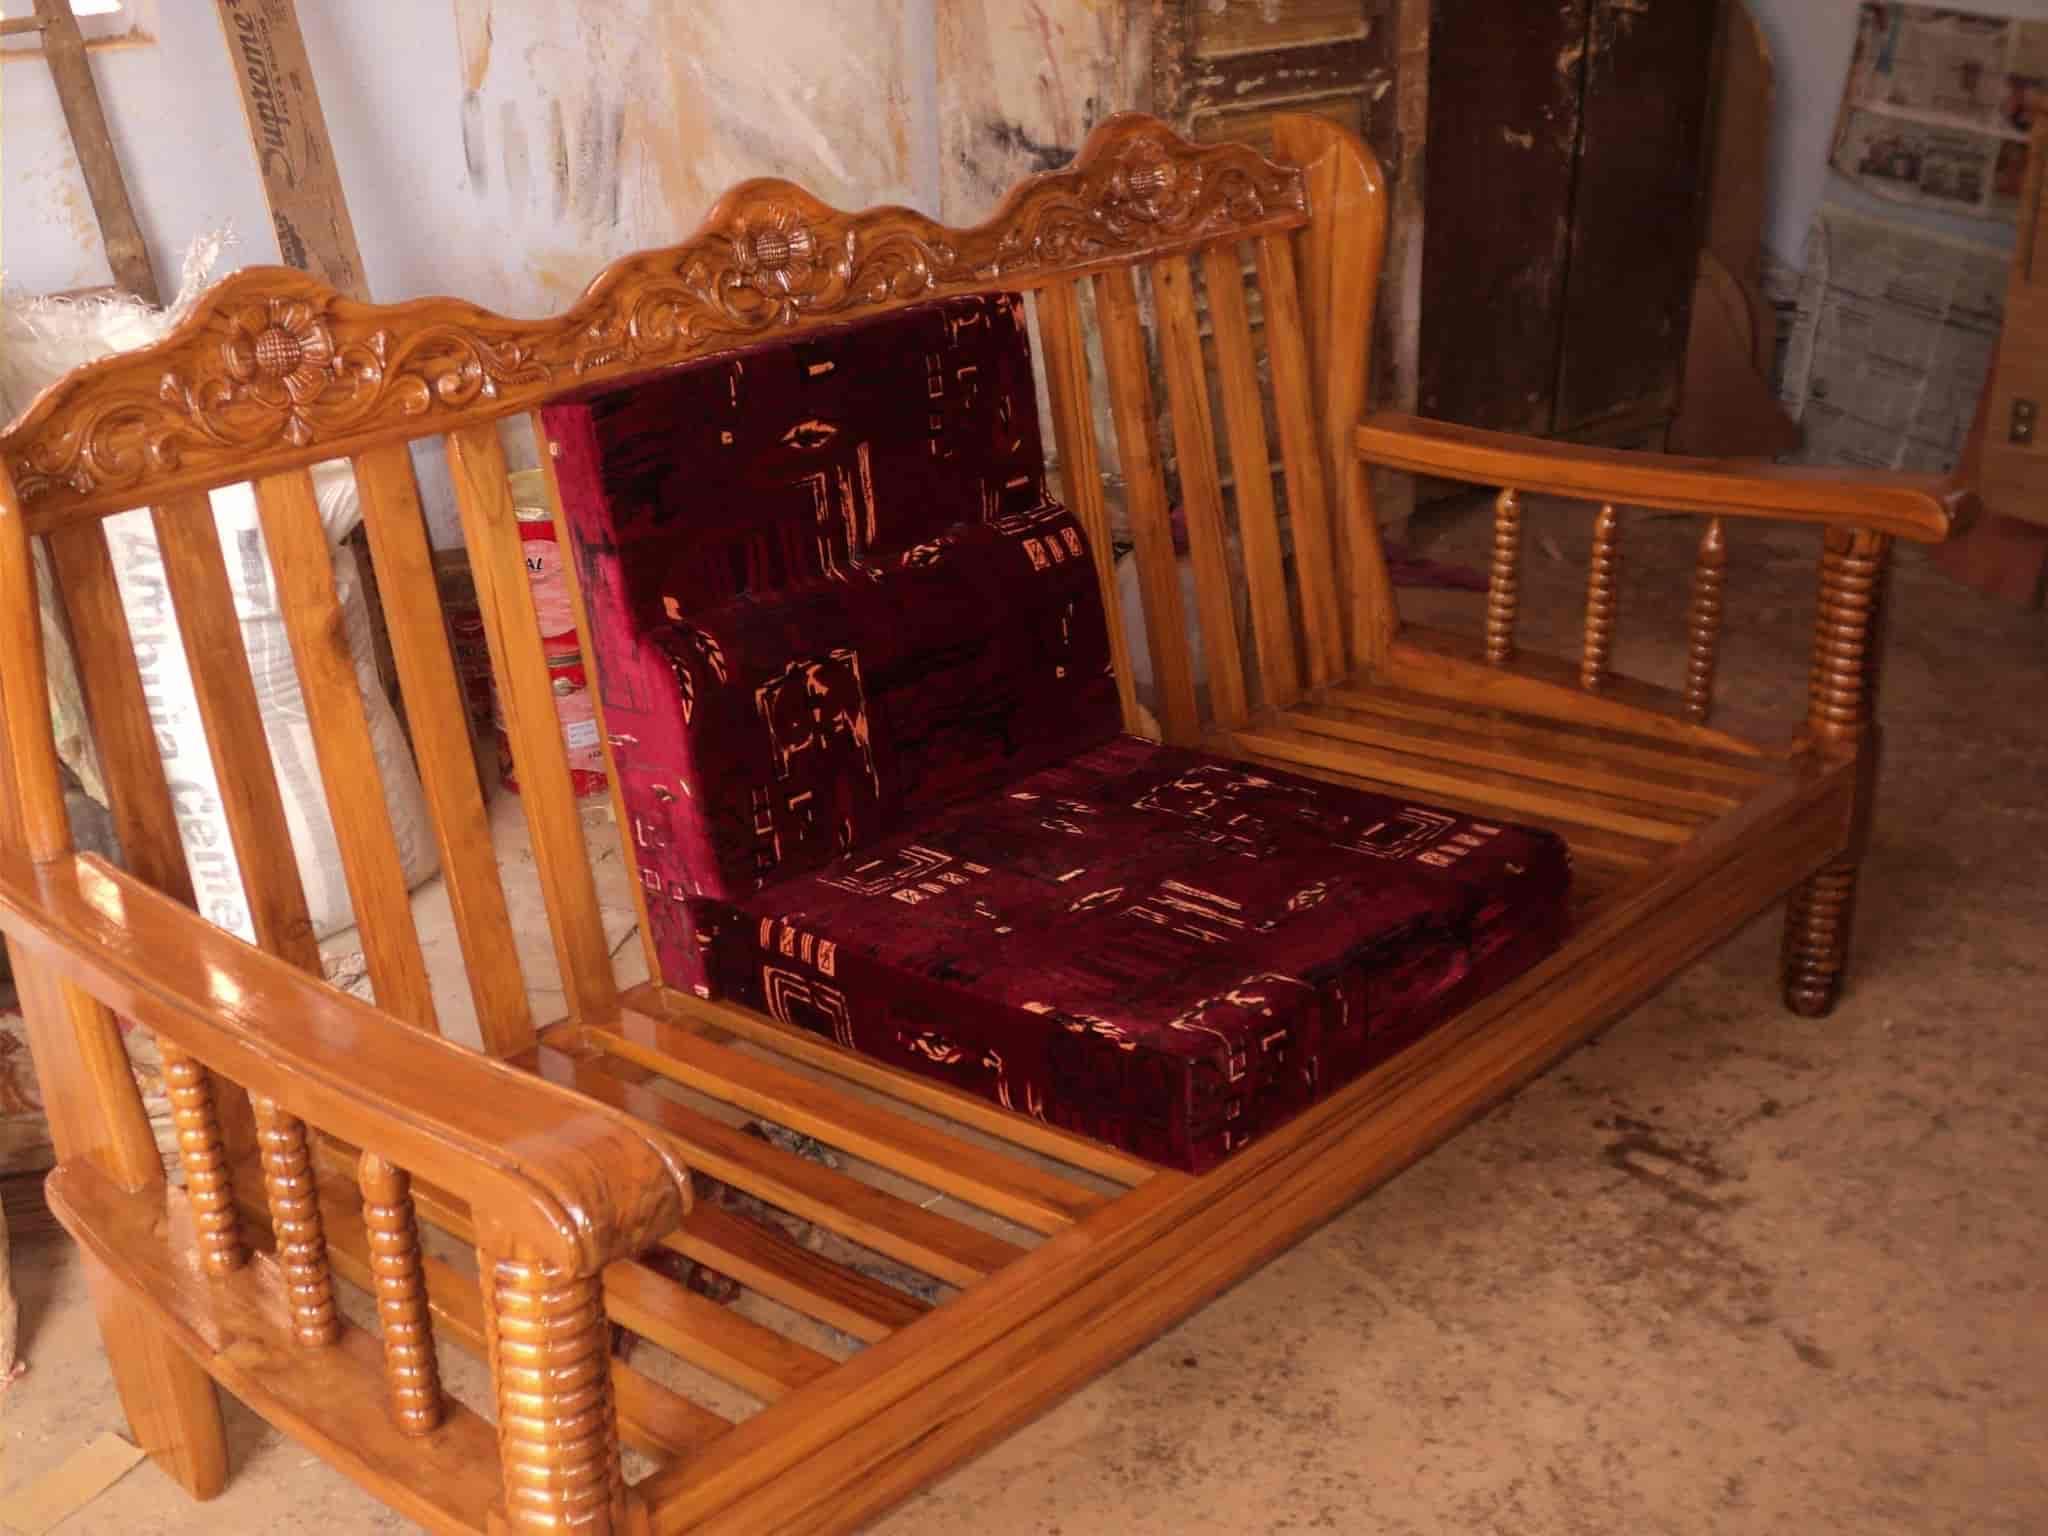 rani wood furniture, palakarai furniture manufacturers in trichyrani wood furniture, palakarai furniture manufacturers in trichy justdial